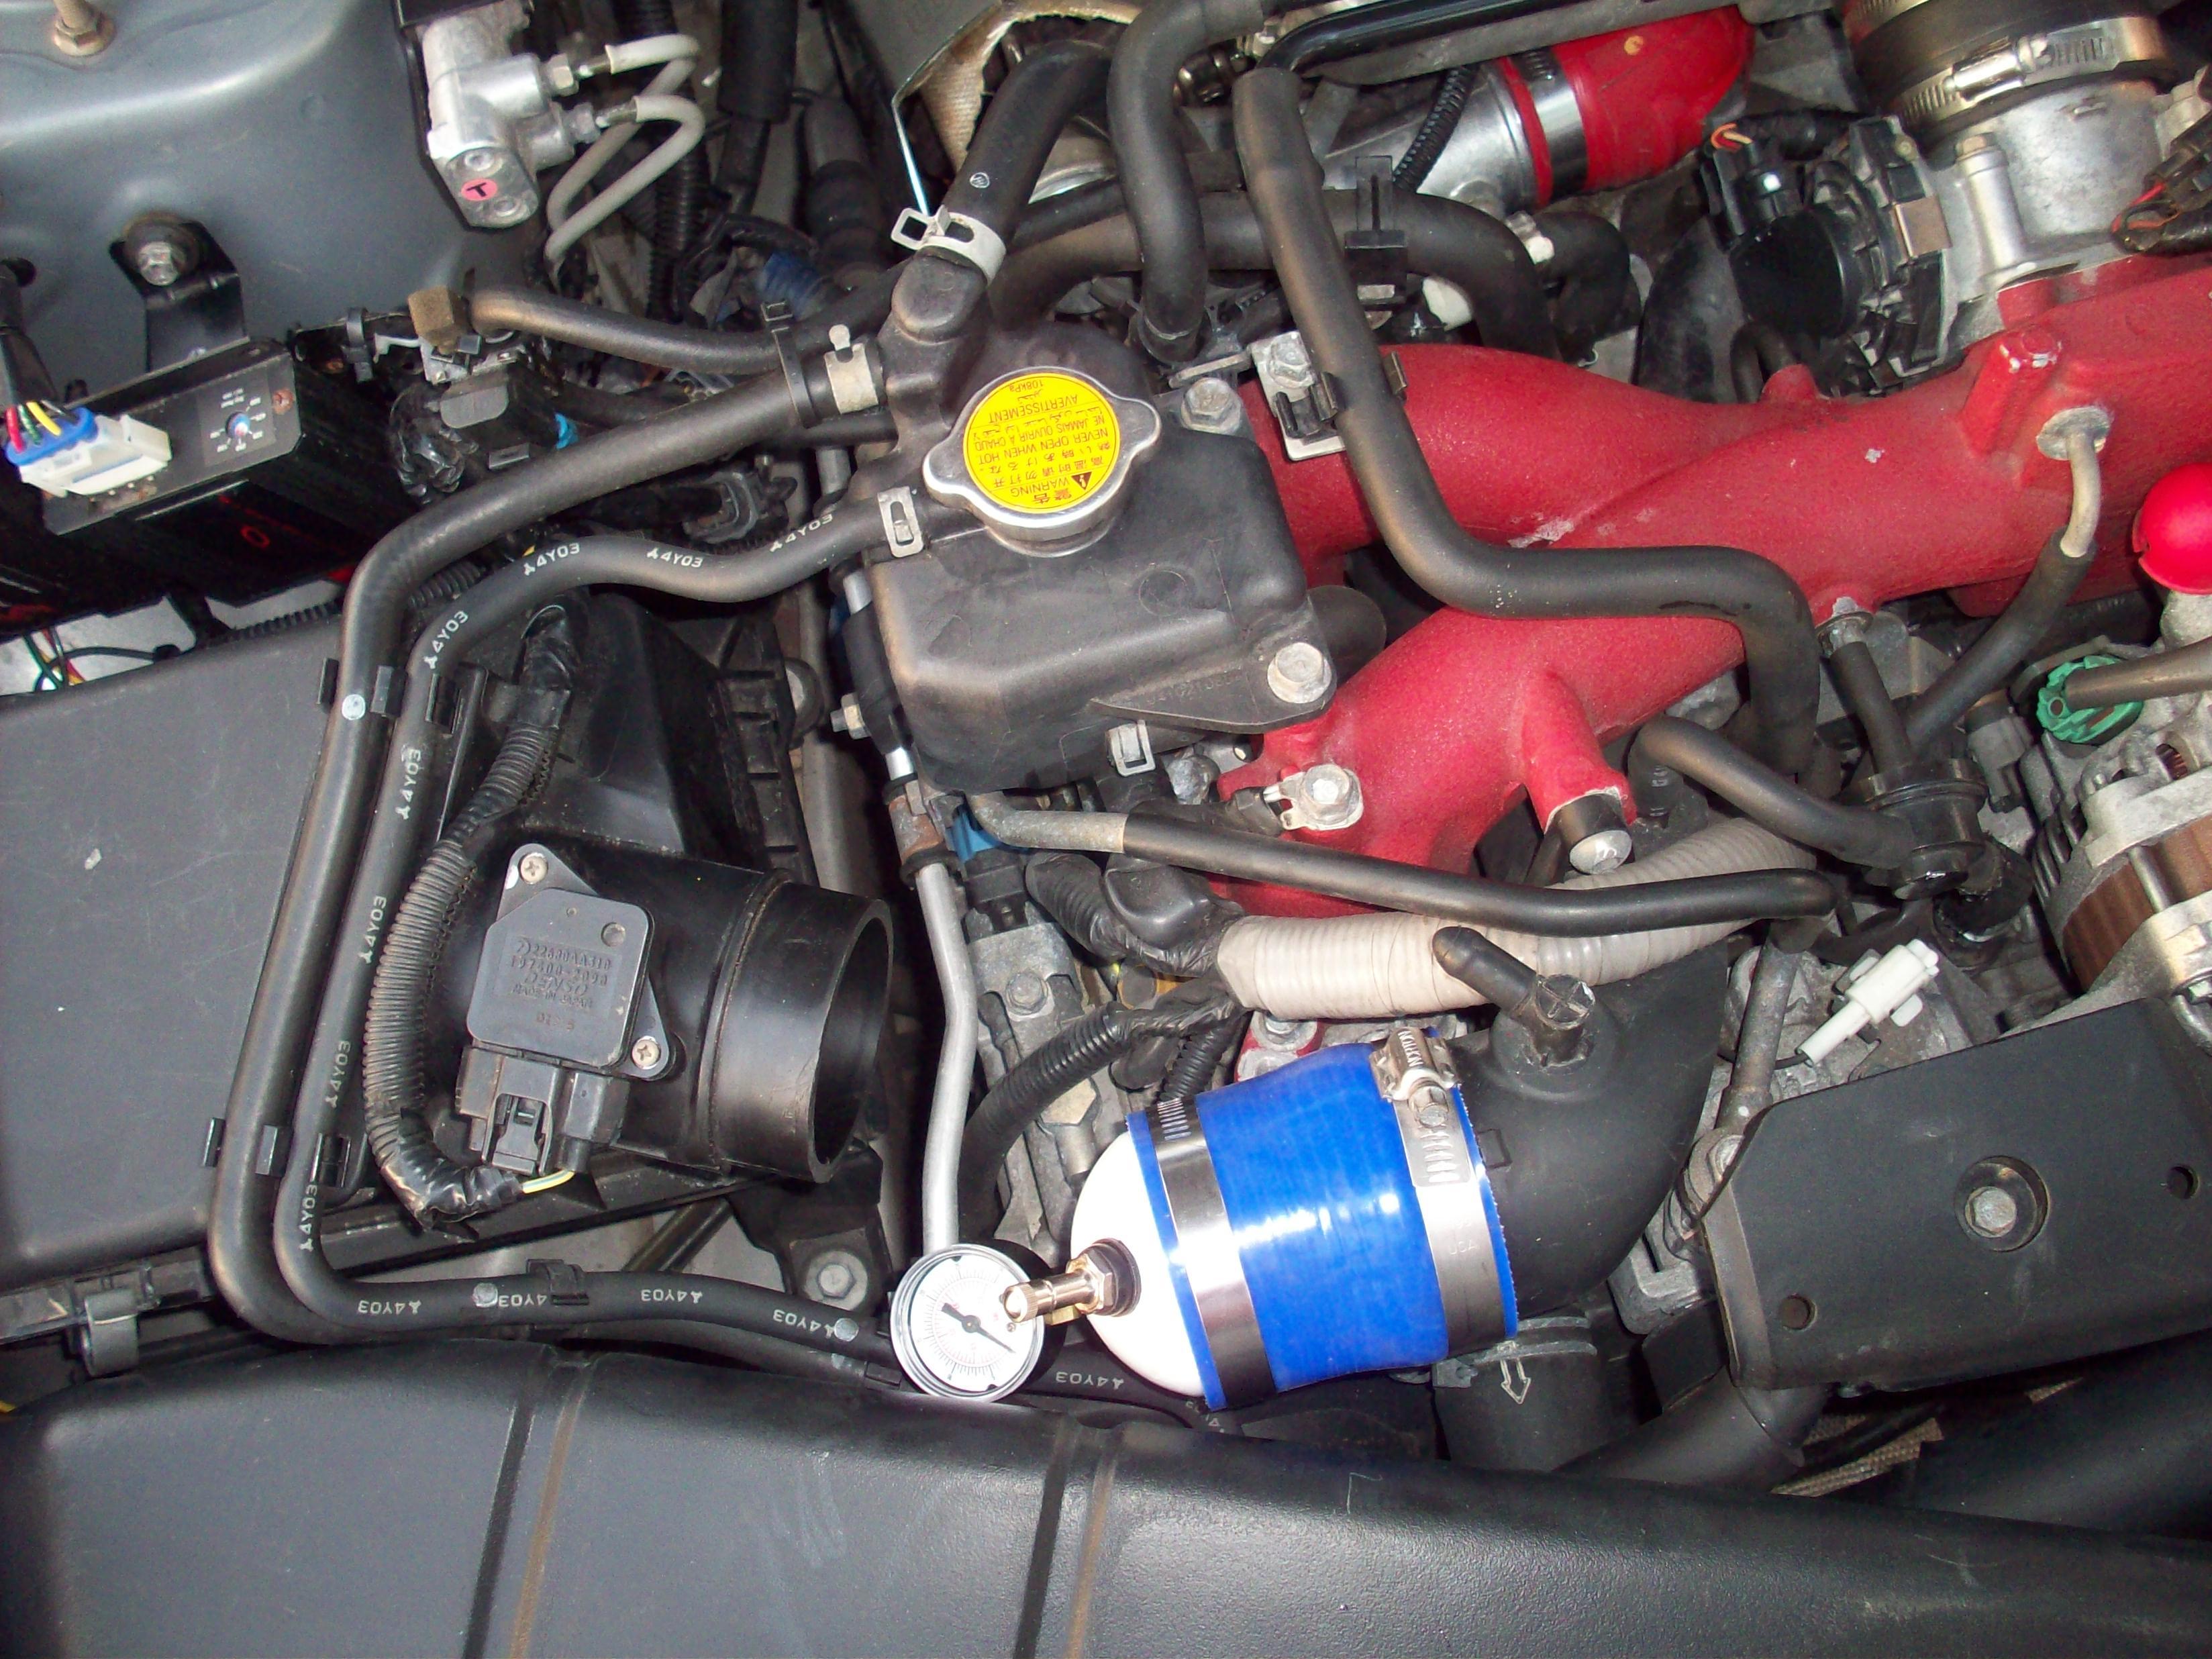 subaru2?t=1422674539 how to boostleak test a subaru Subaru Firing Order Diagram at creativeand.co